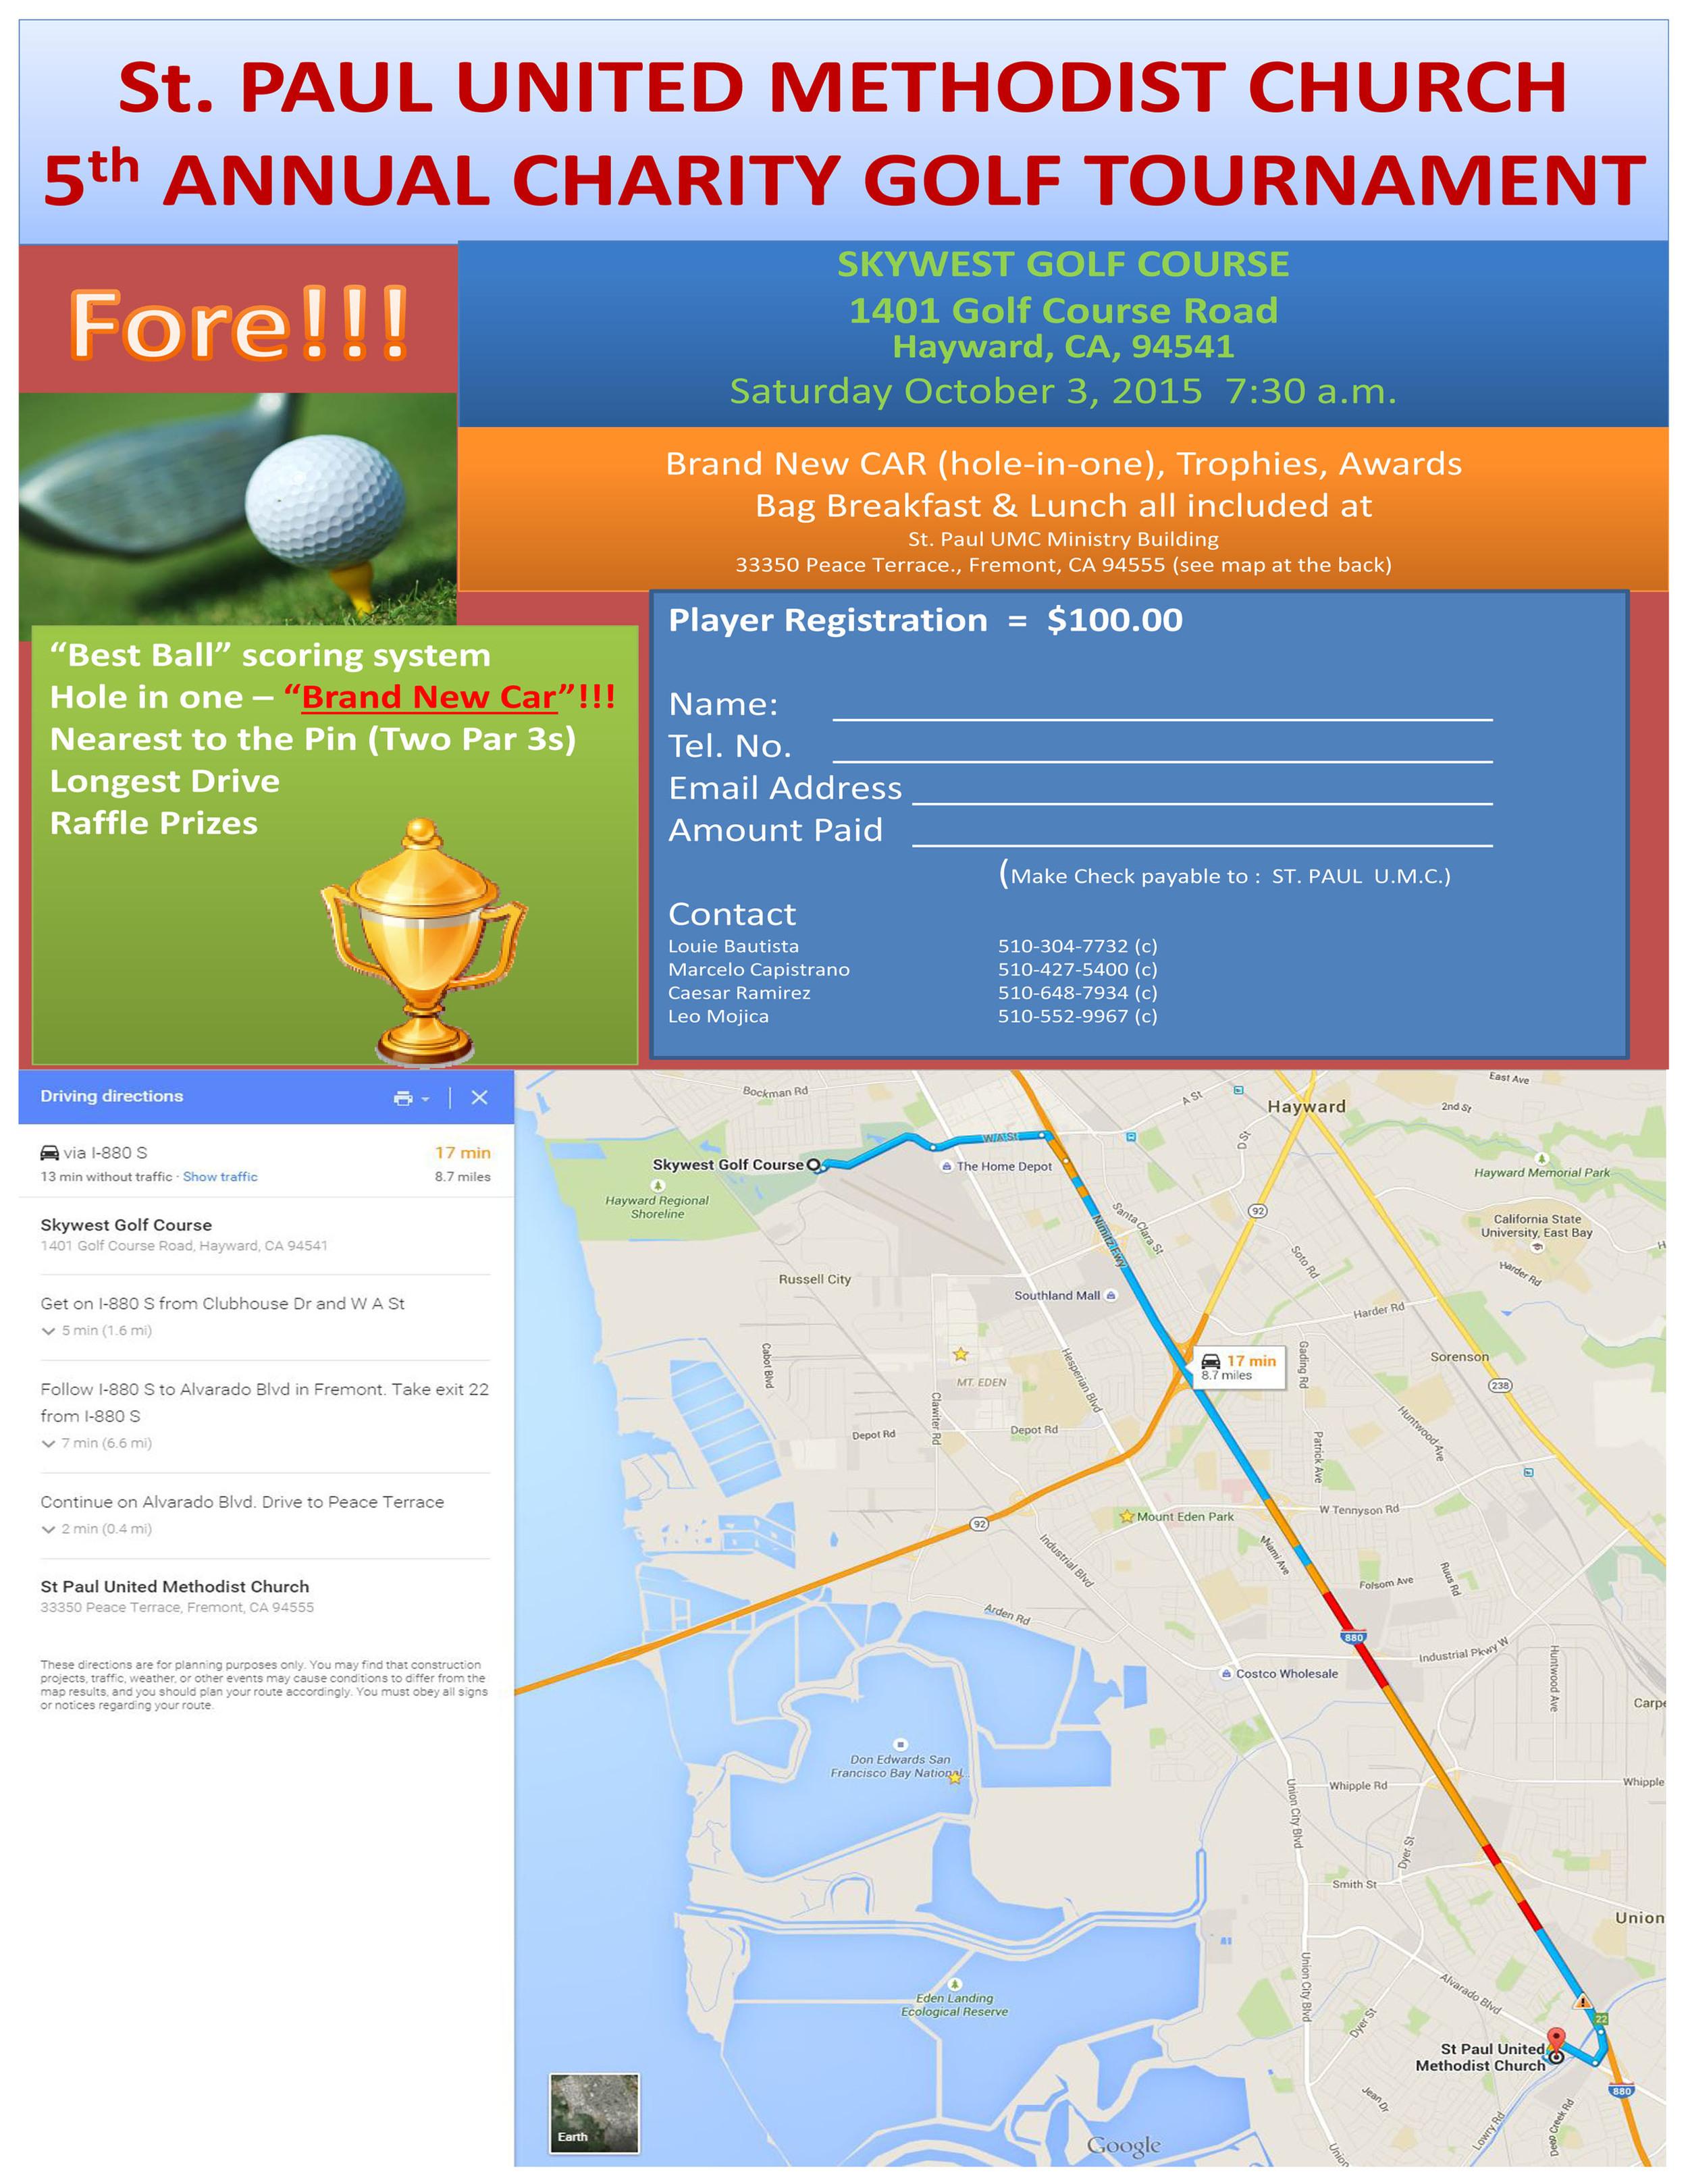 UMM Golf tourney 2015 flyer